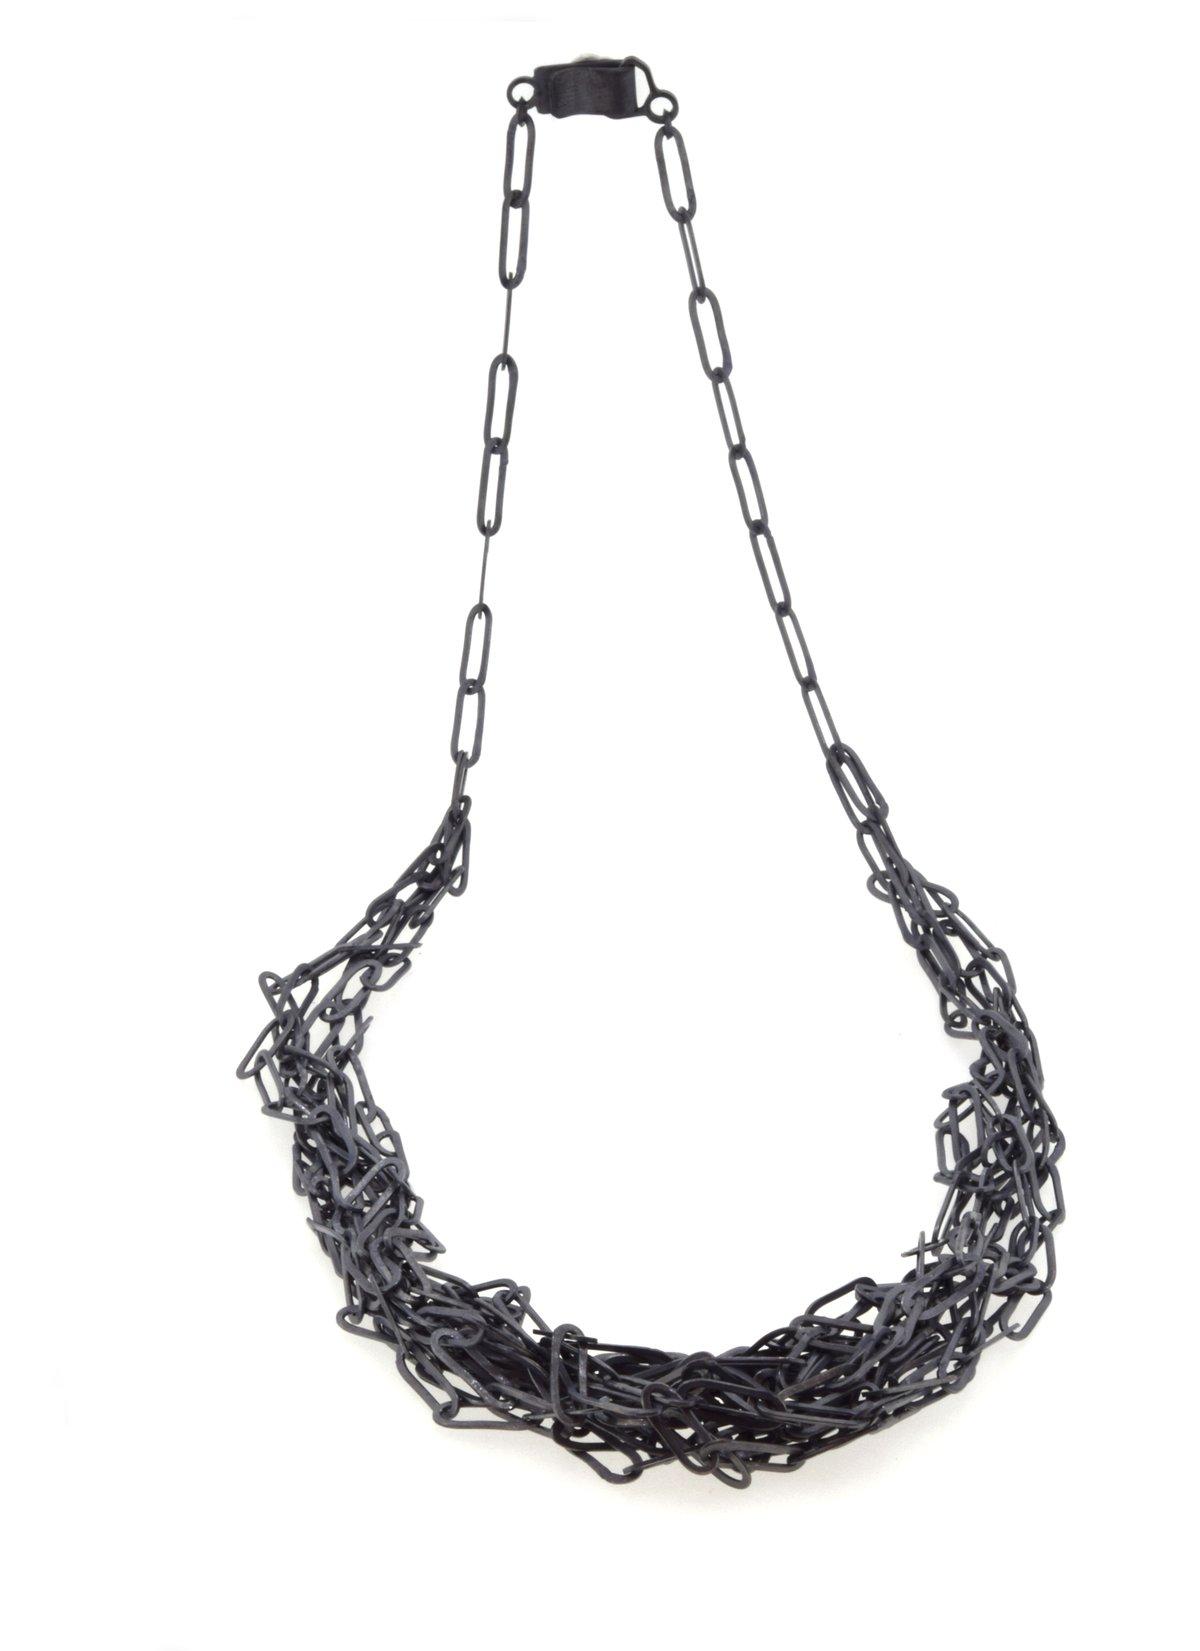 Oxidised silver chaos chain